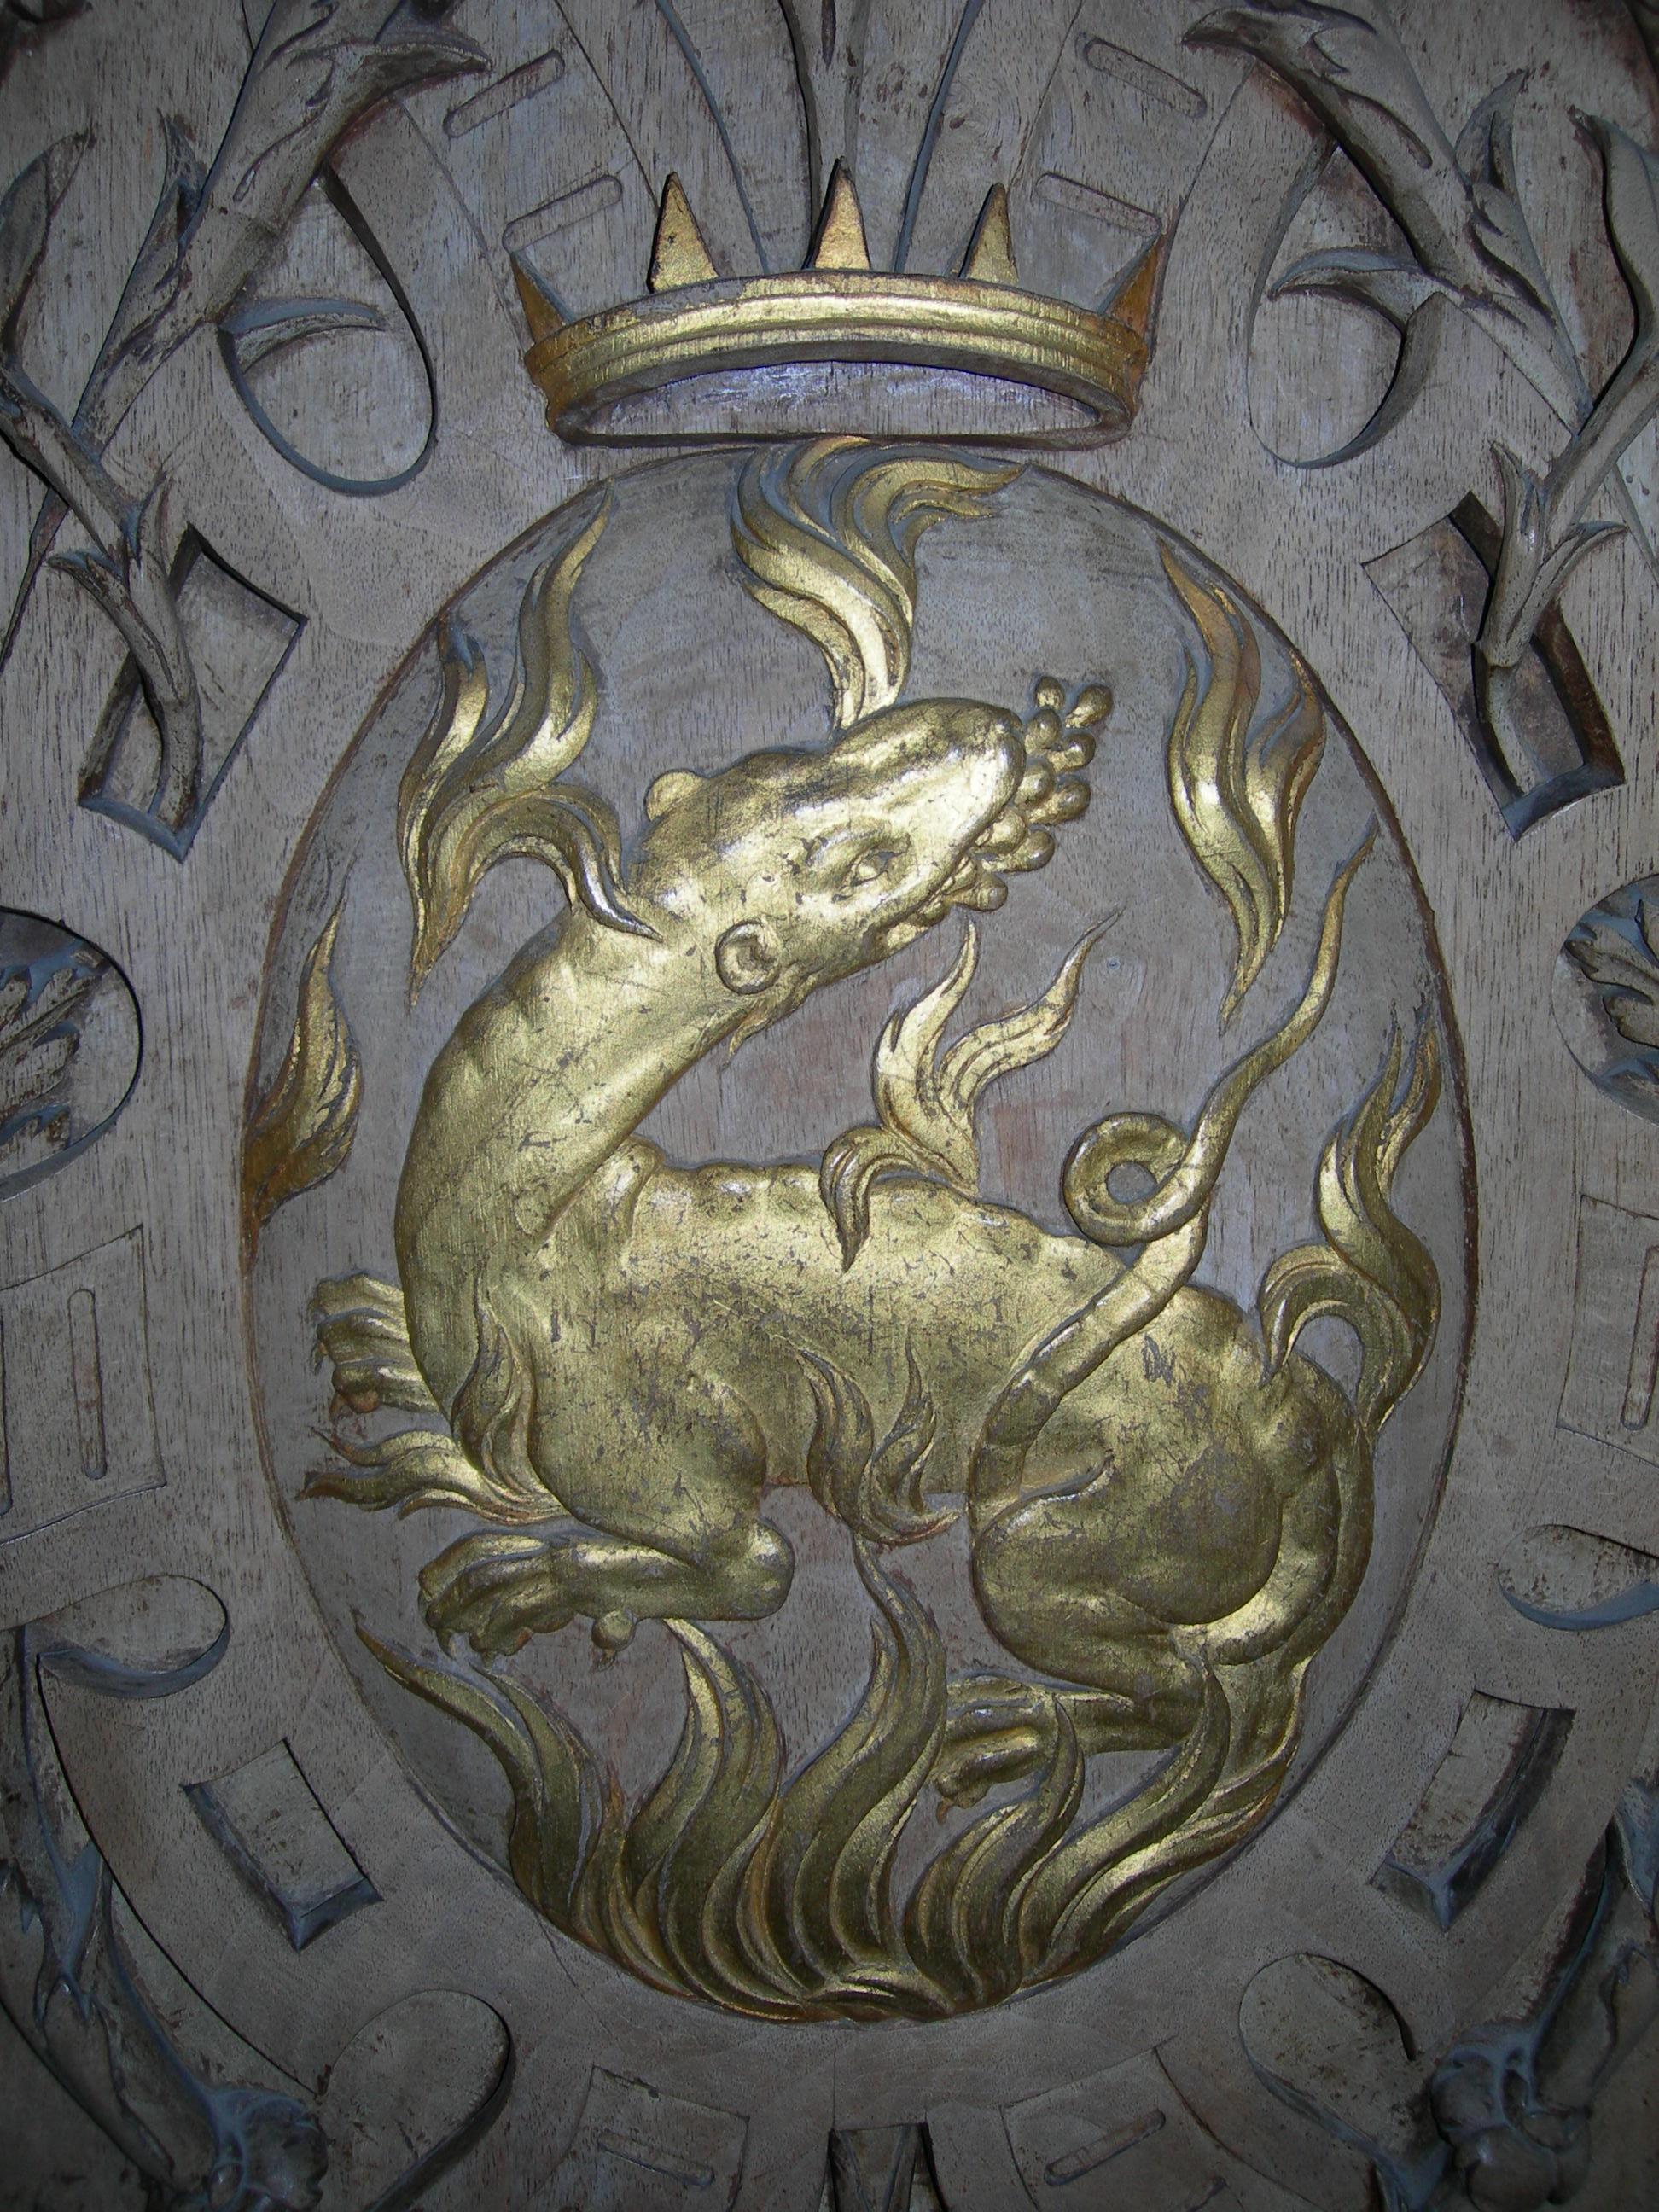 Salamander (mythological beast)